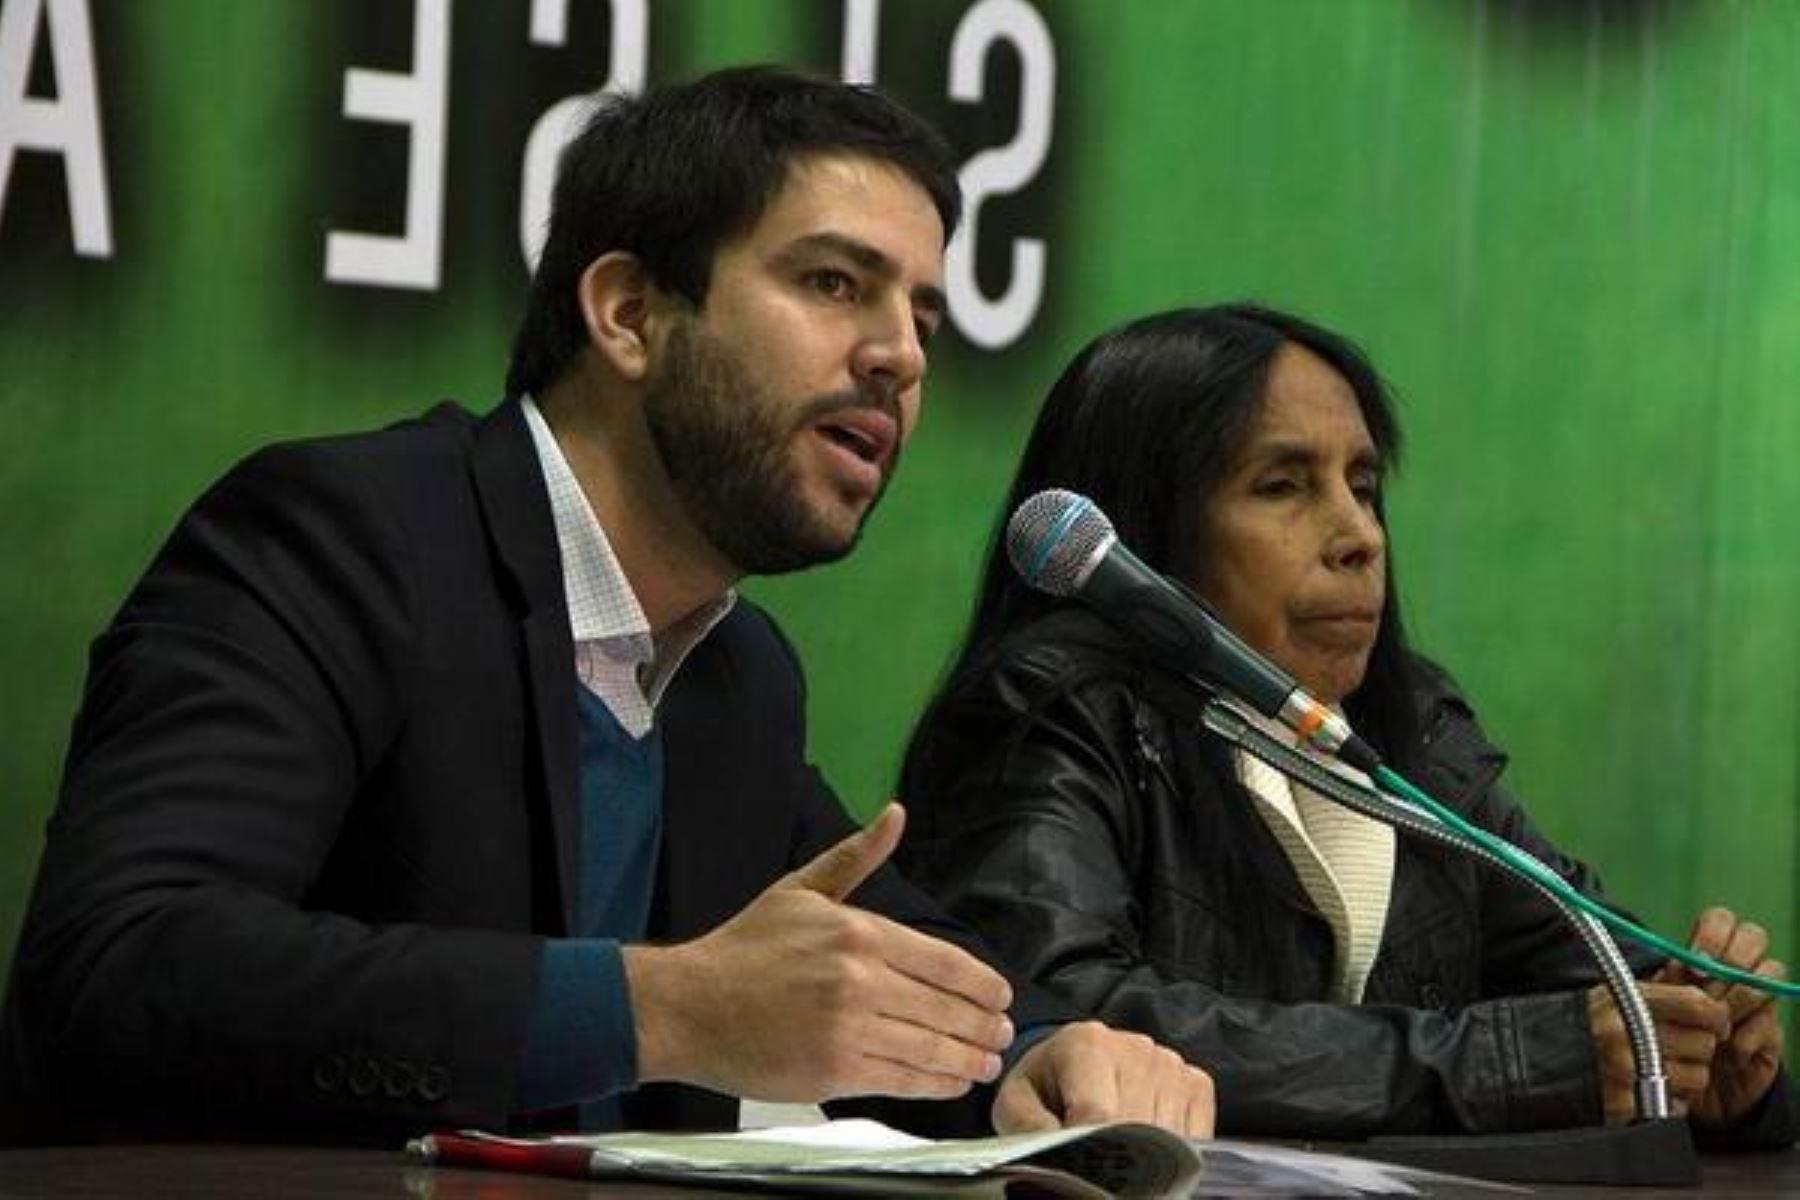 Foto: Internet/Medios.